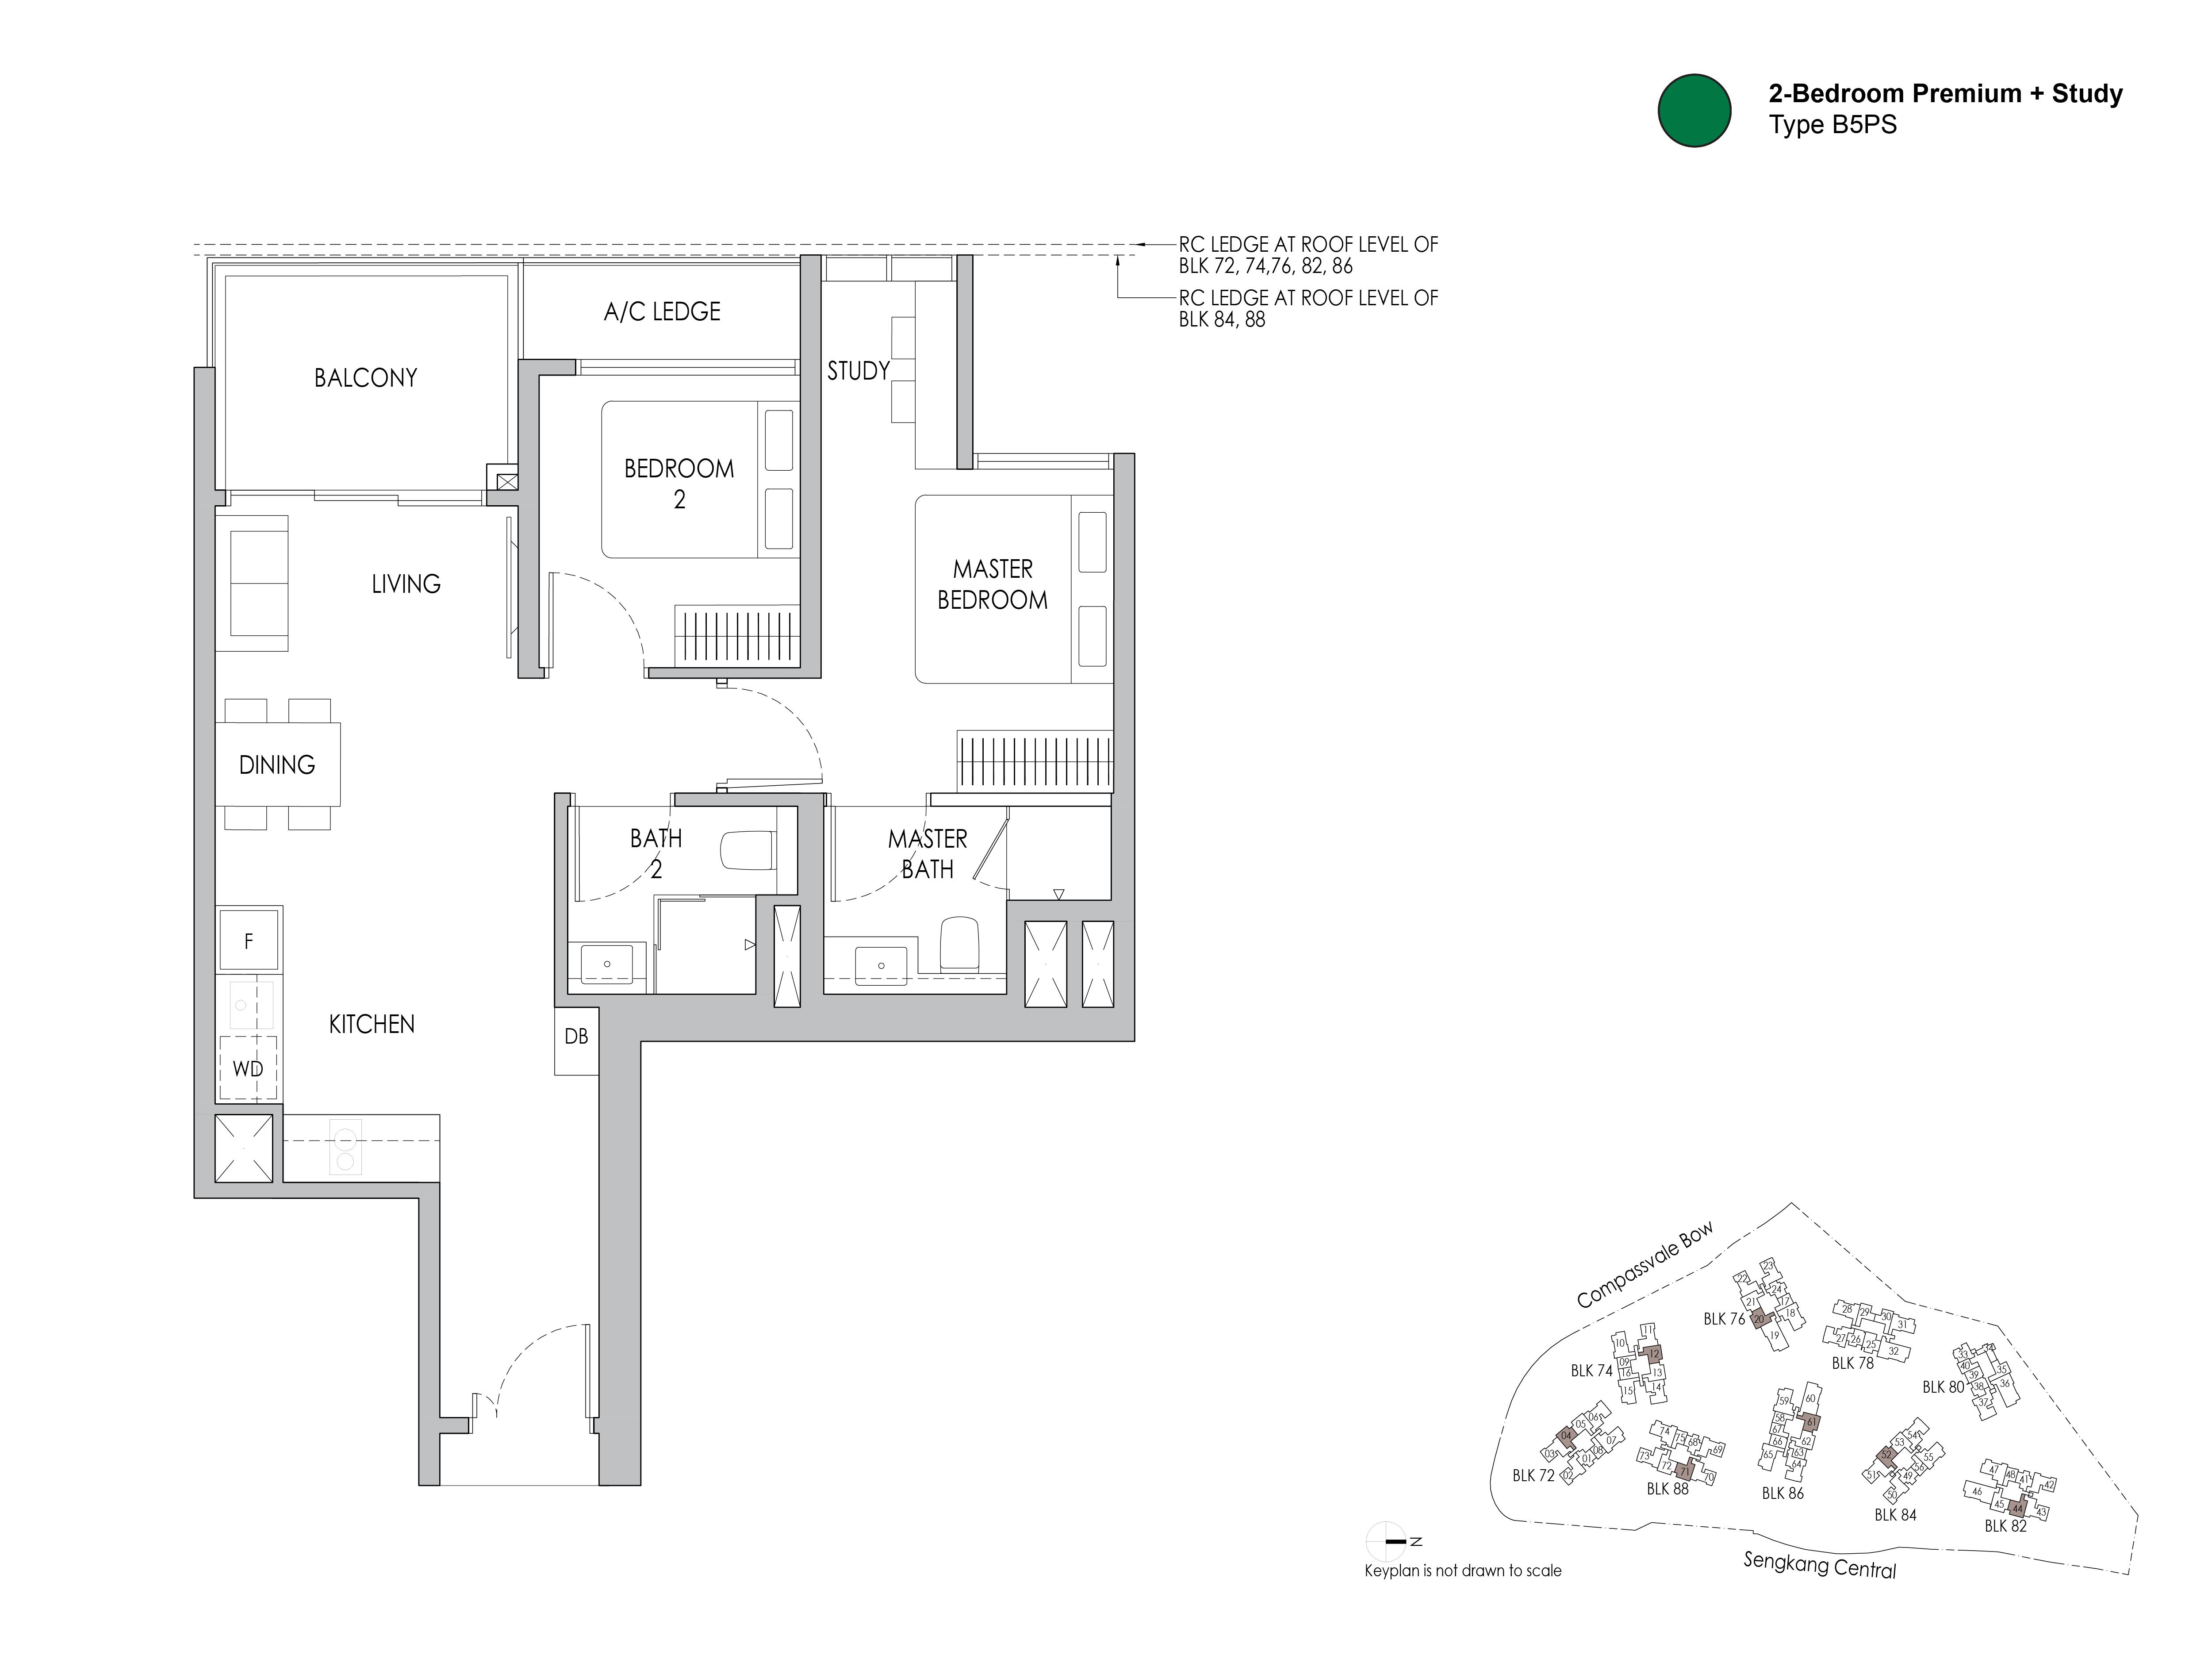 SengKangGrandResidences_2-Bedroom Premium+Study_Type_B5PS.png